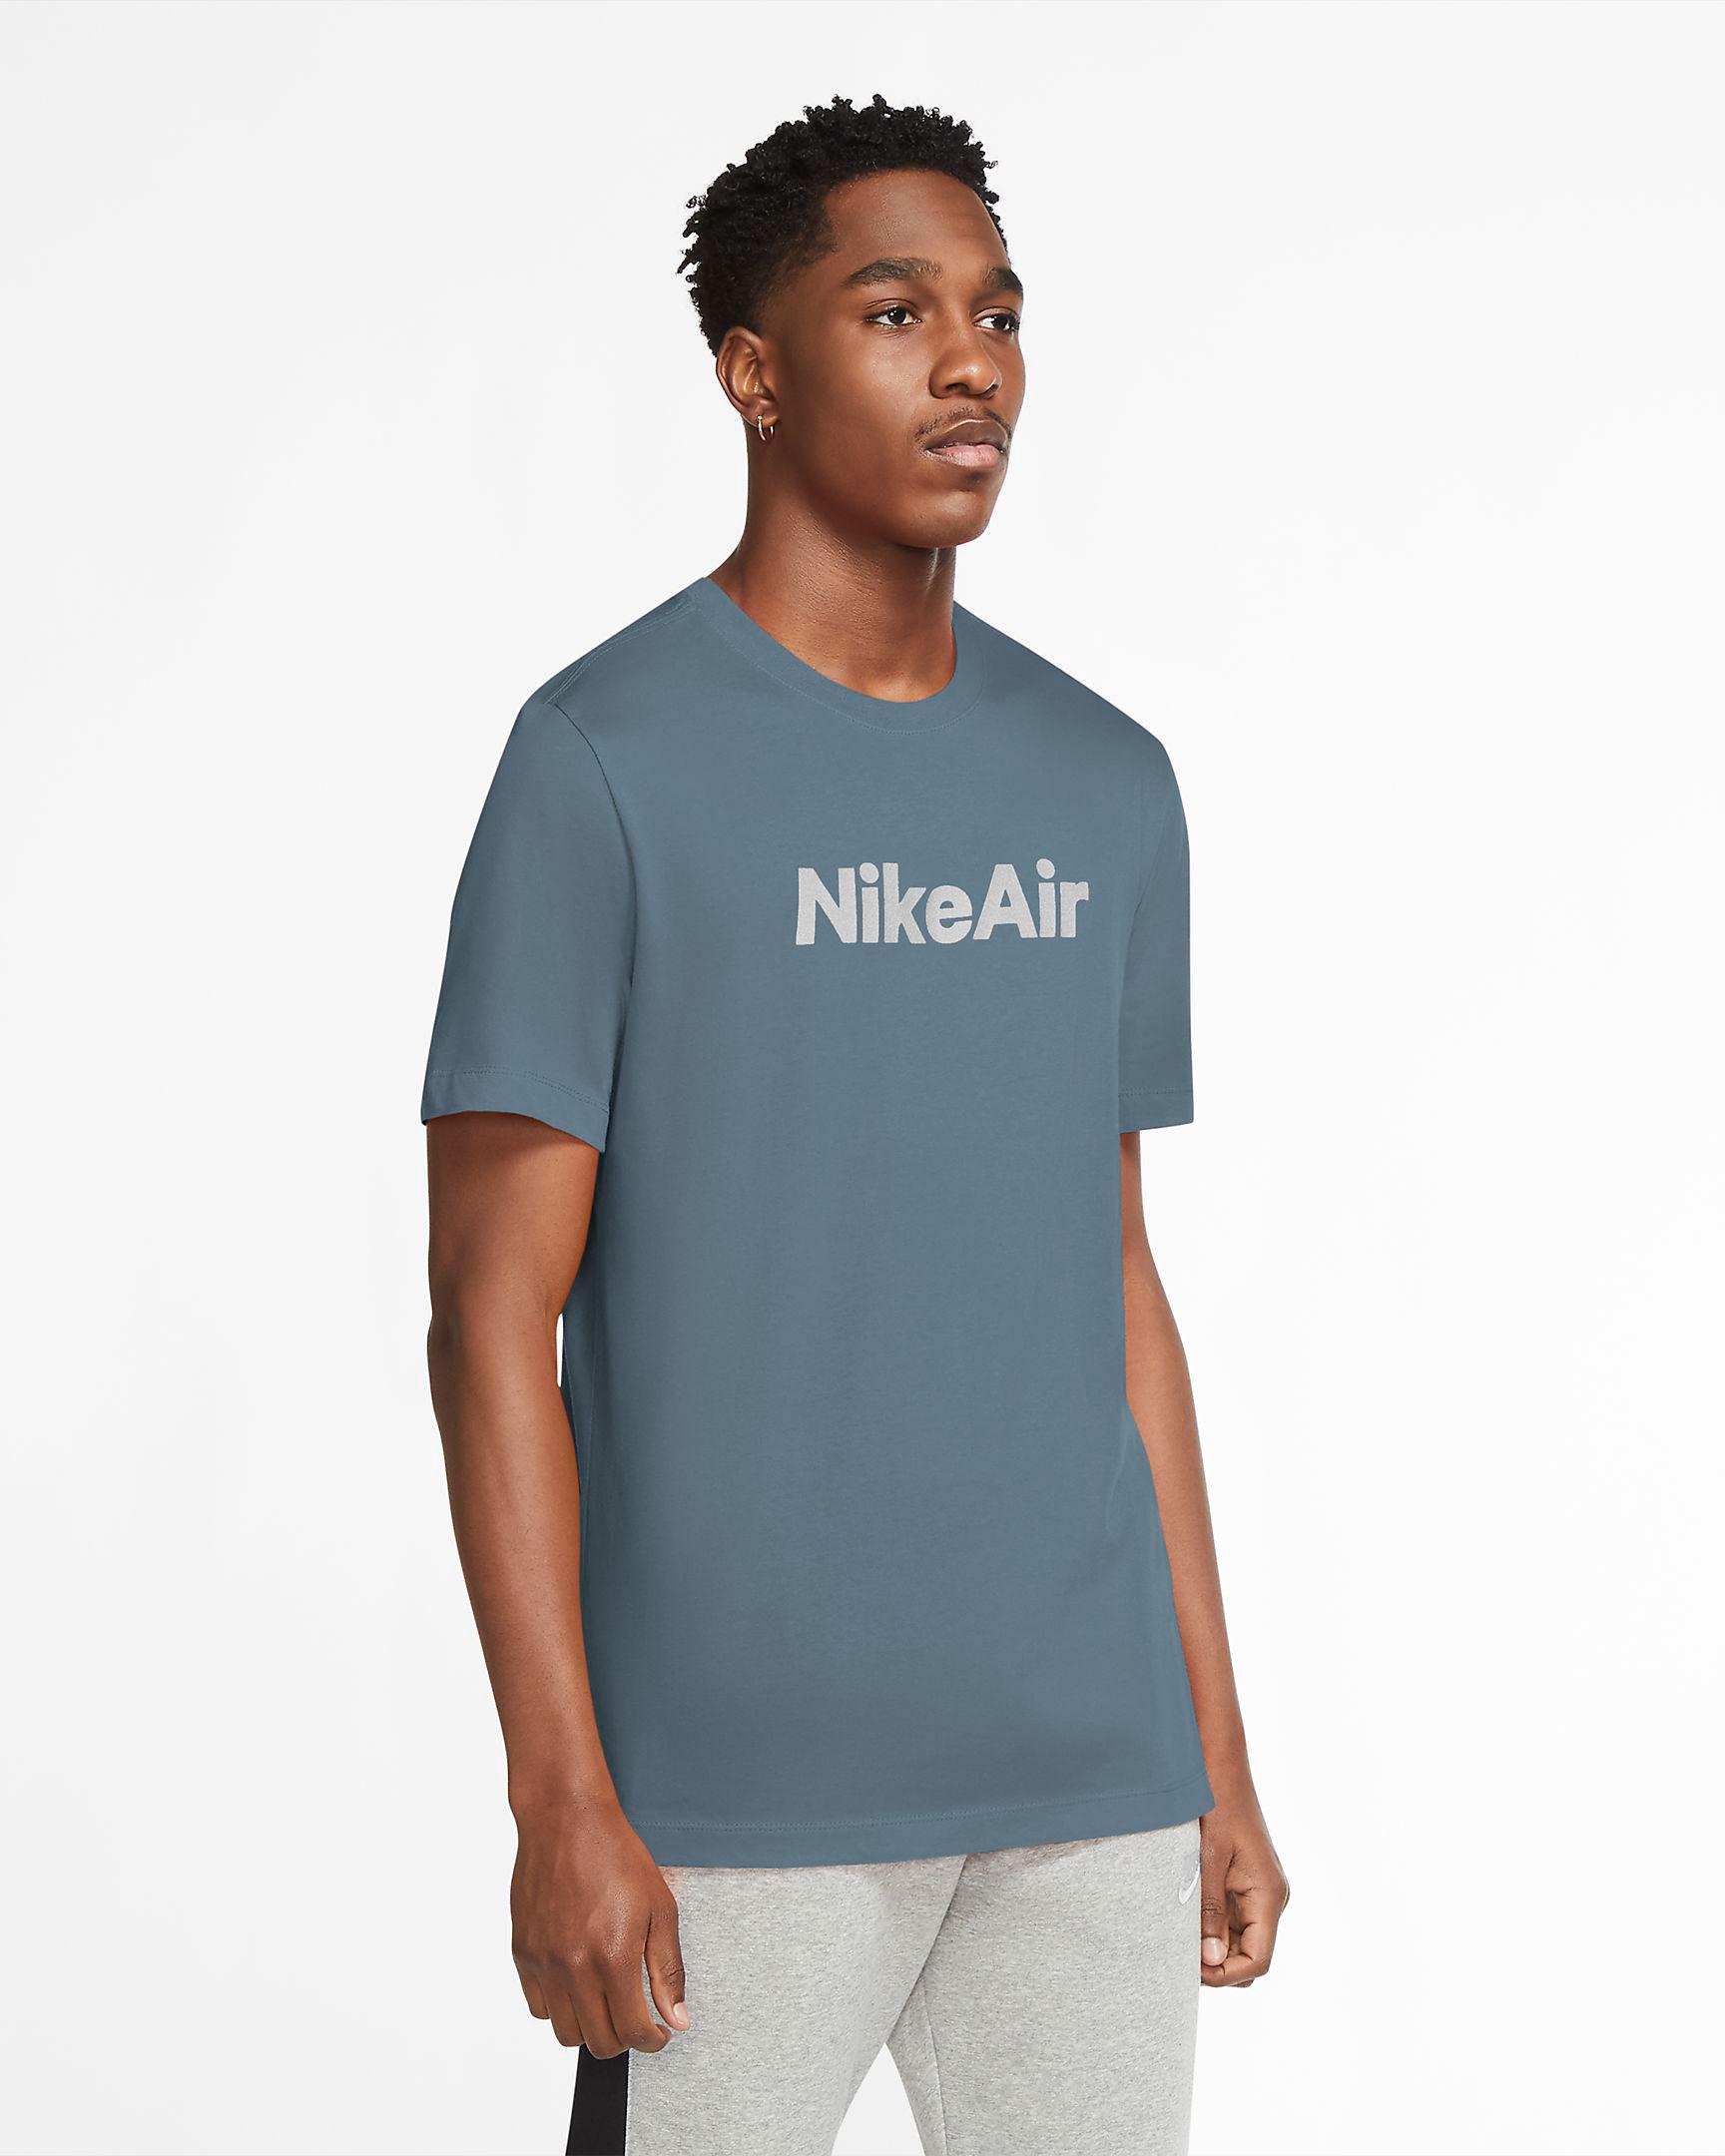 nike-kobe-ad-nxt-blue-hero-t-shirt-match